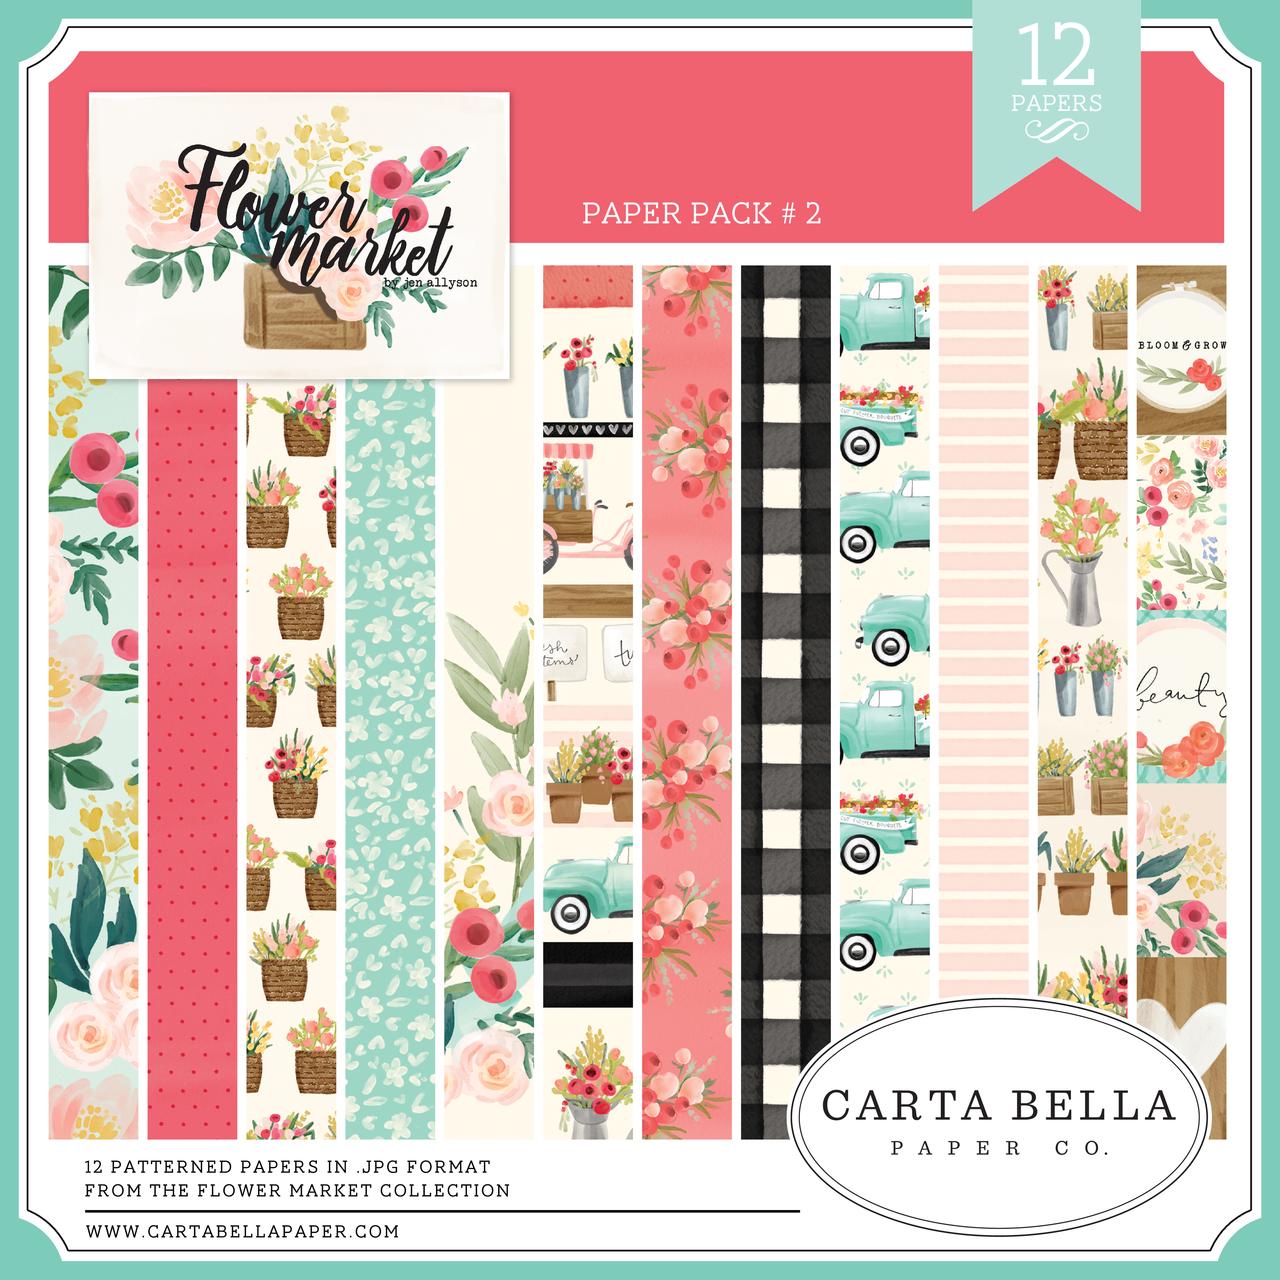 Flower Market Paper Pack #2